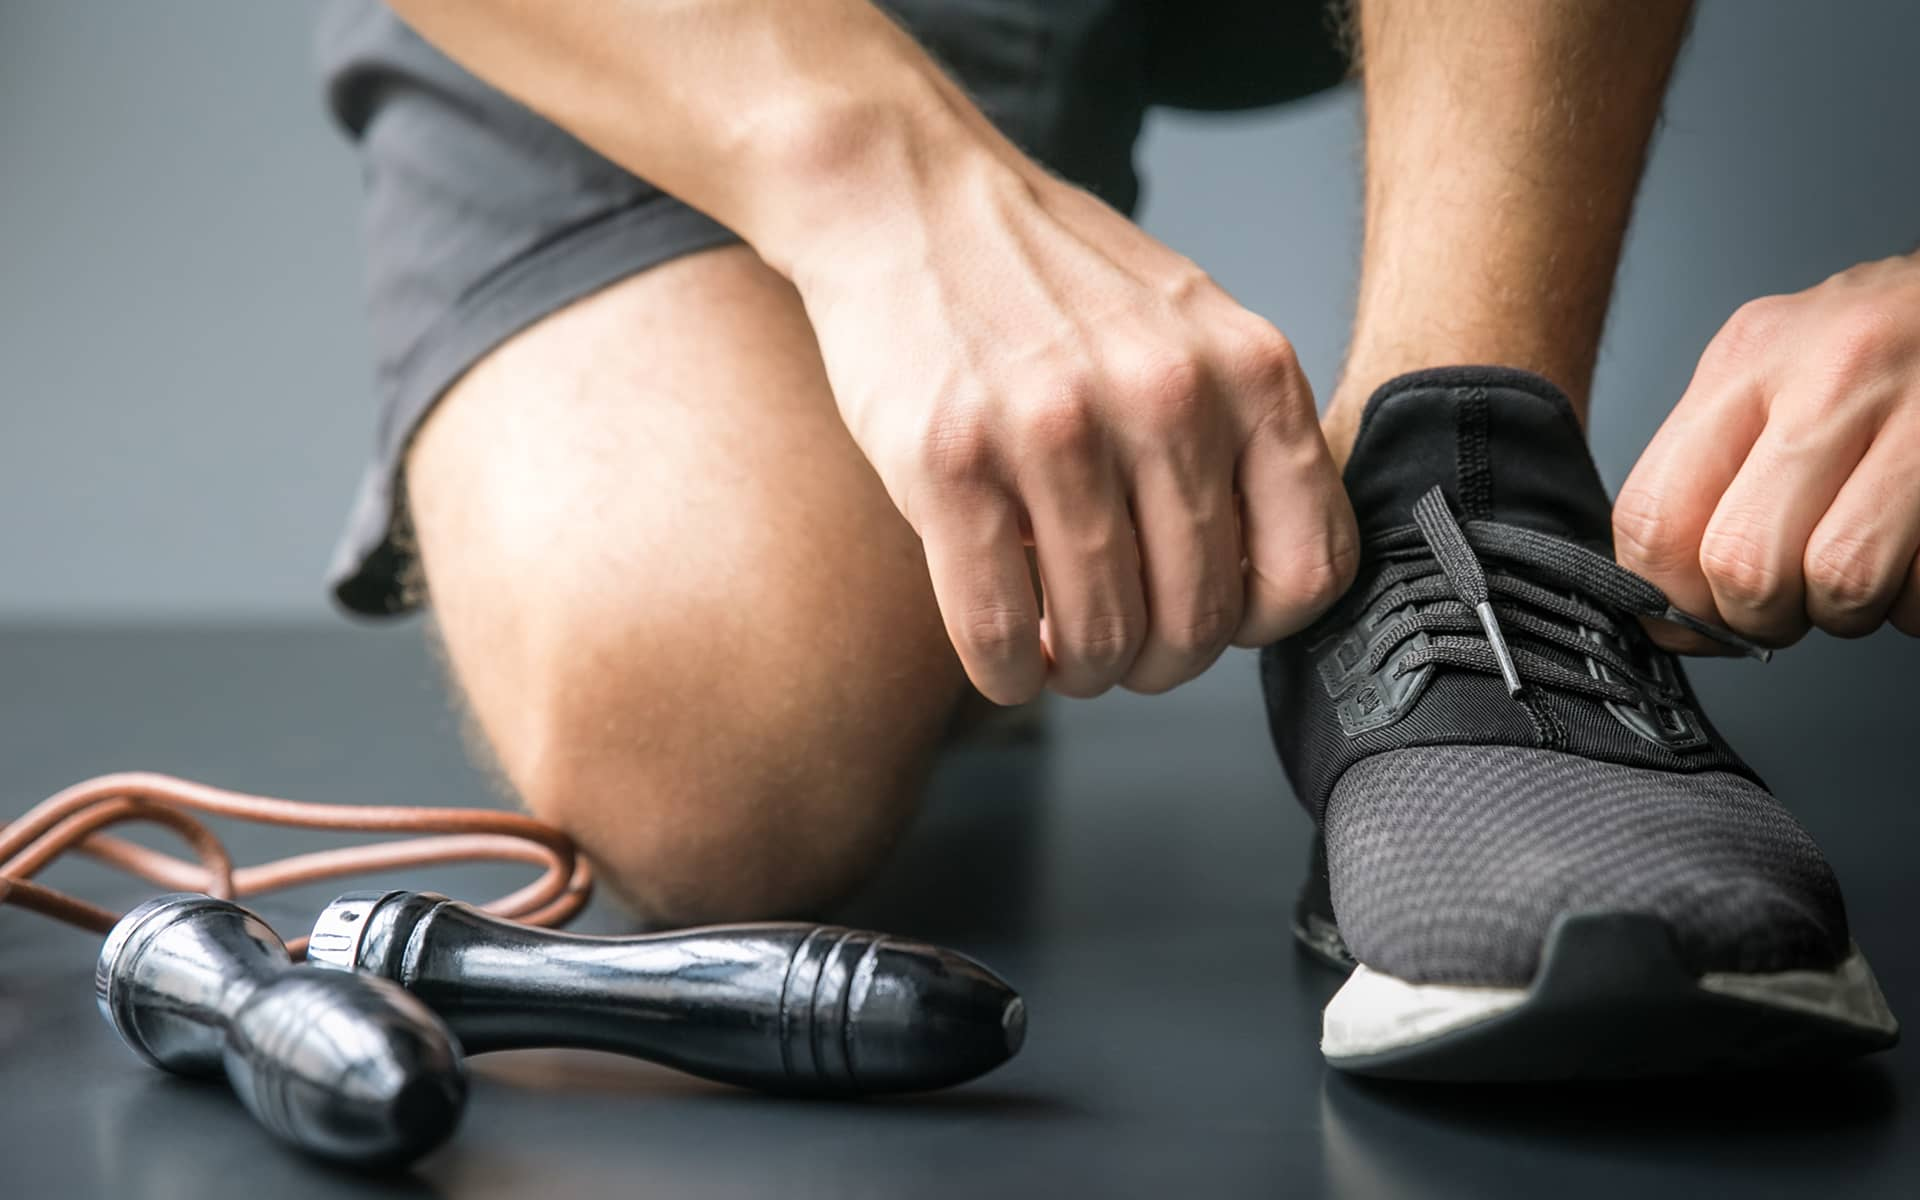 Exercices d'échauffements